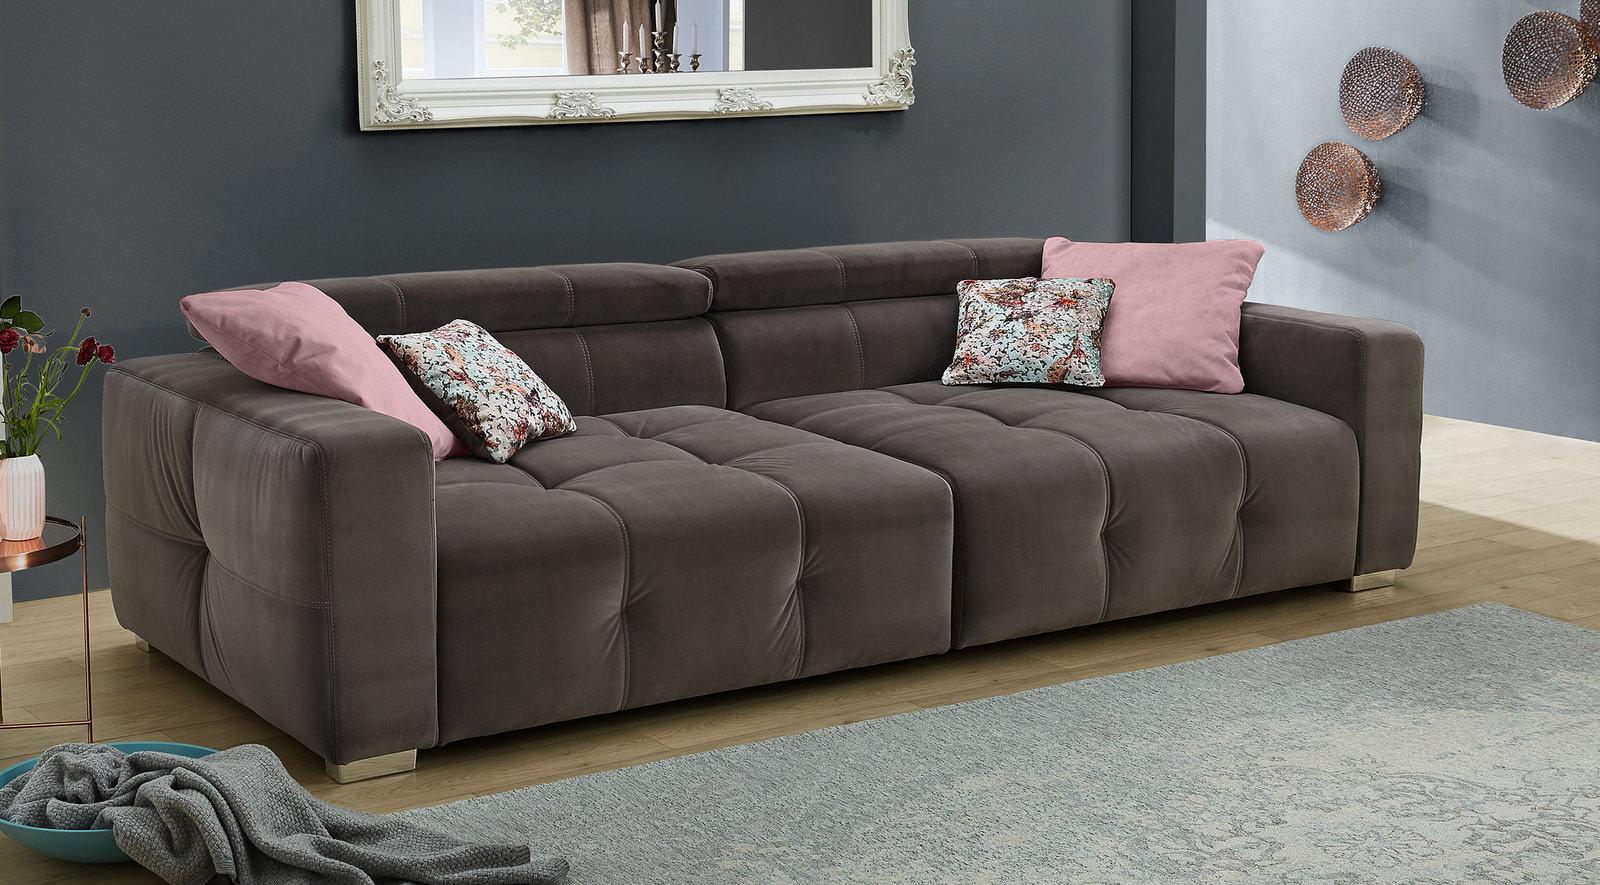 big couch good big sofa marbeya x cm hellgrau couch mit. Black Bedroom Furniture Sets. Home Design Ideas